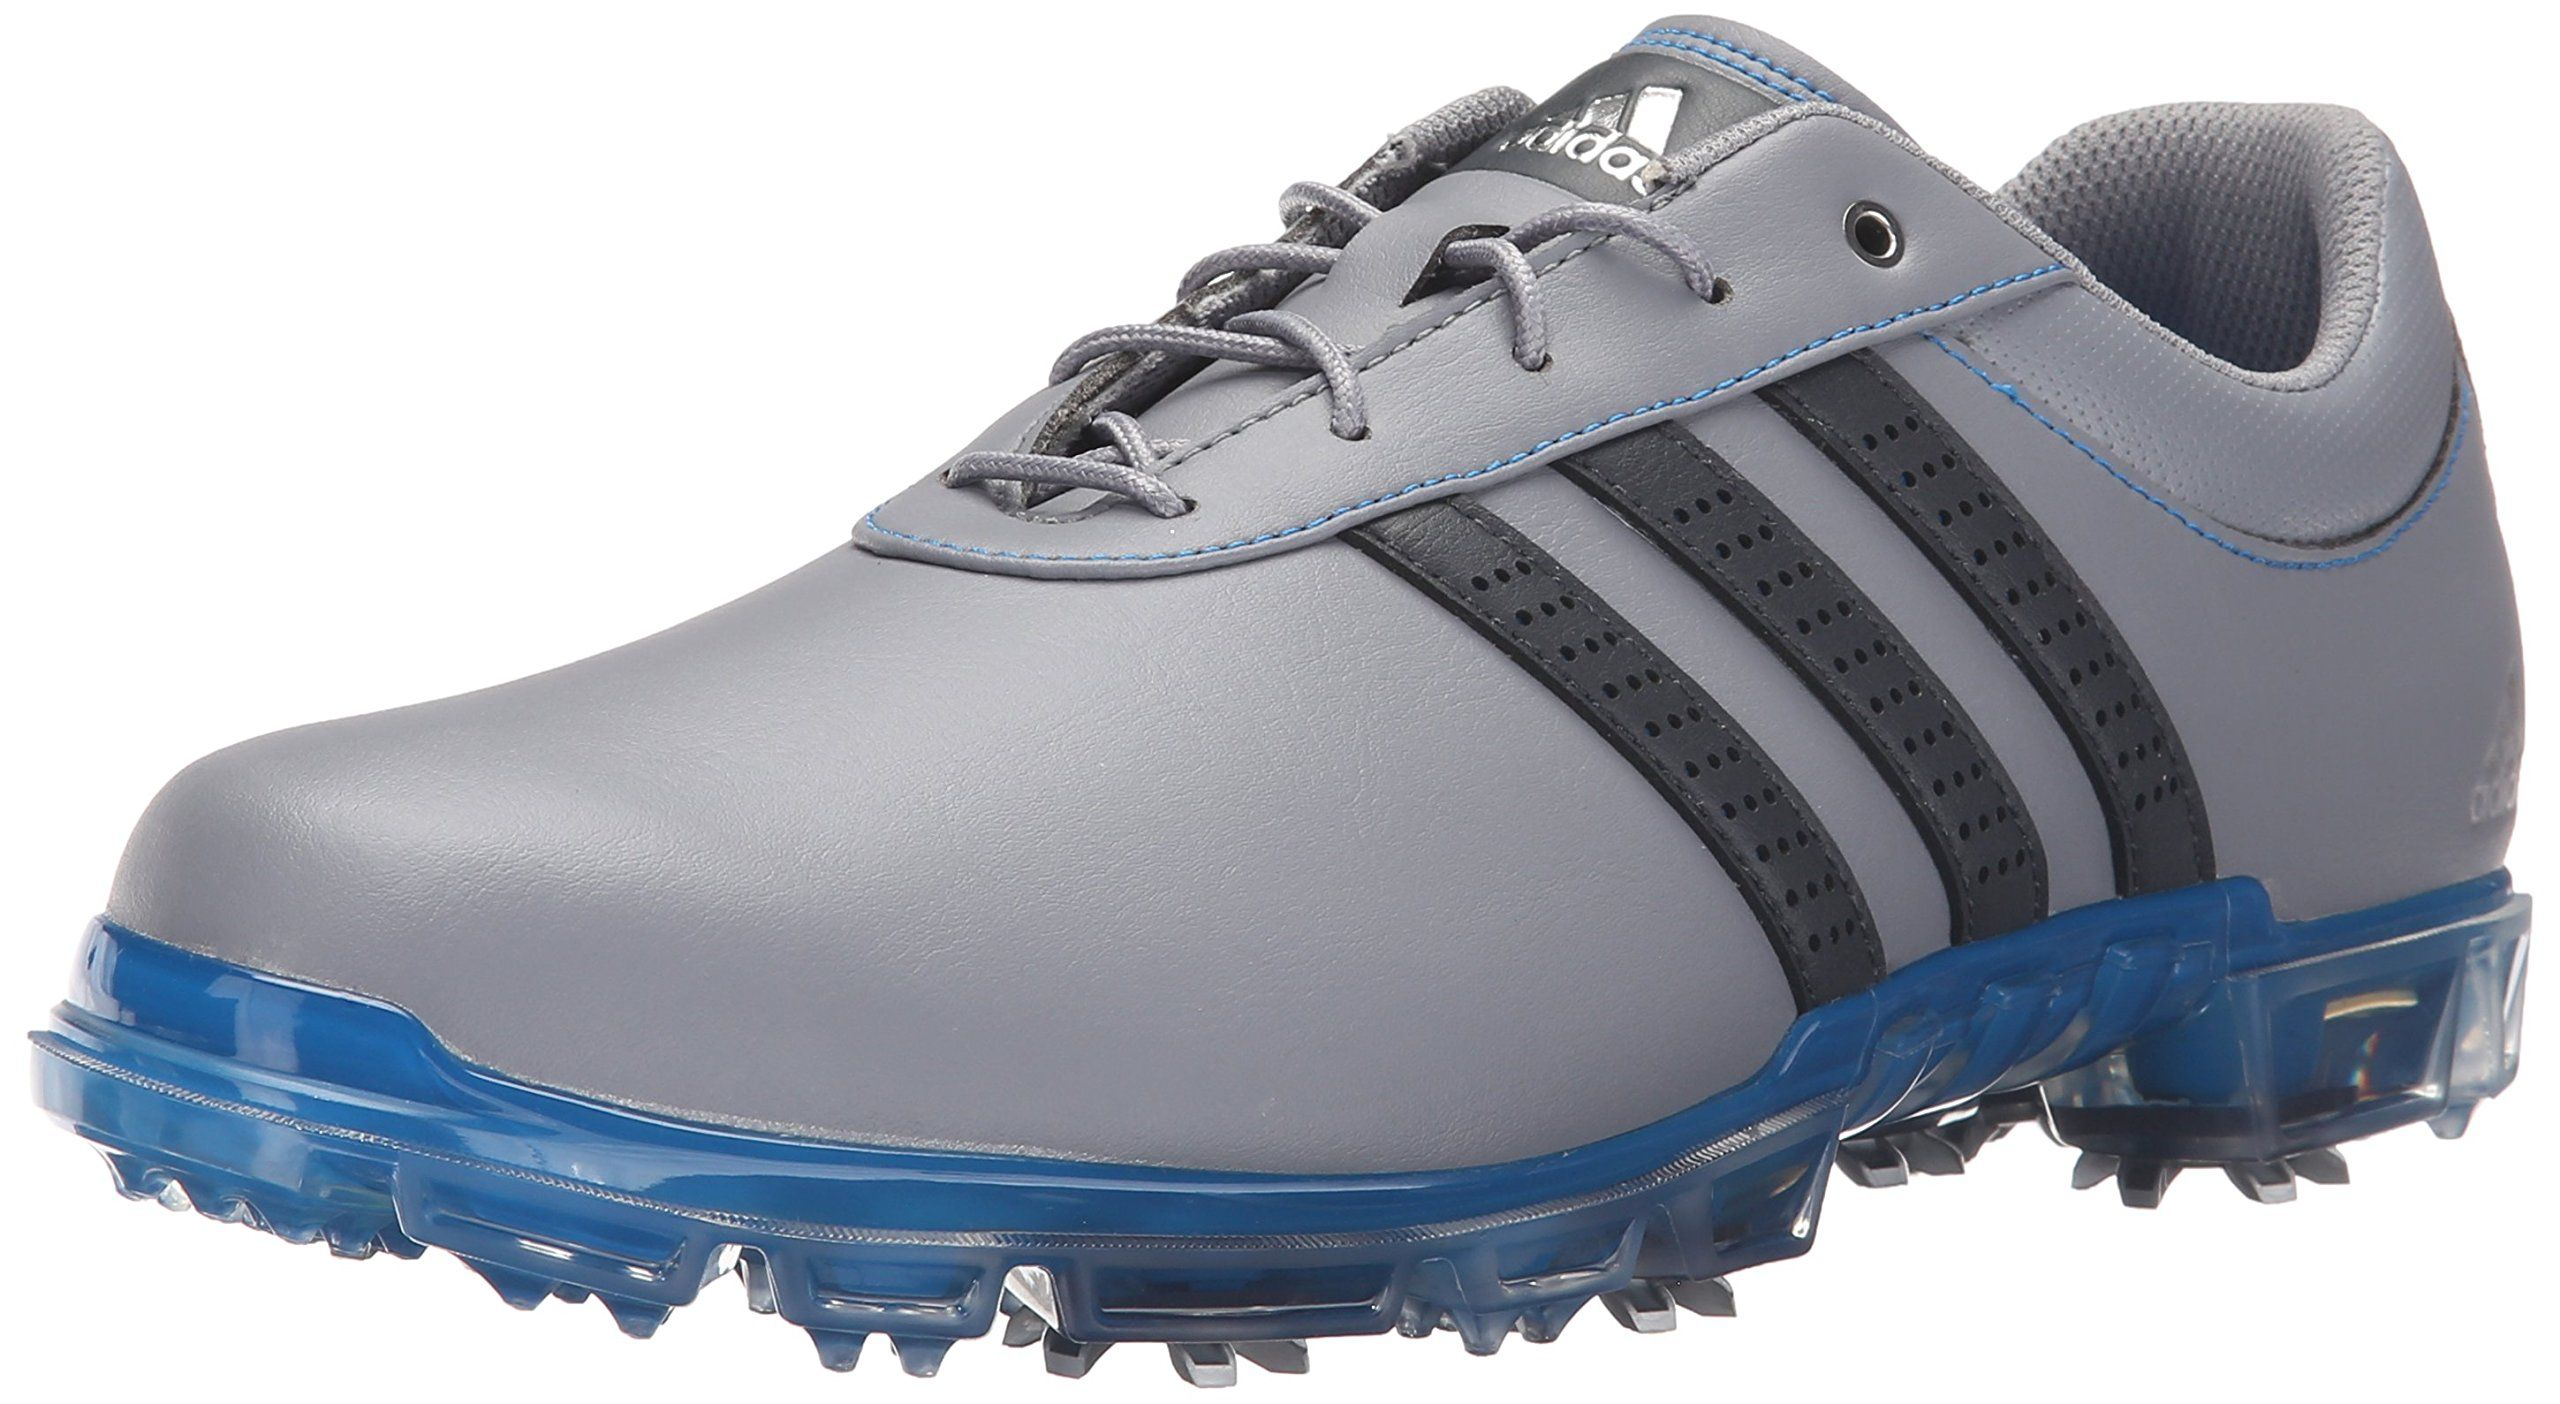 Adidas uomini adipure flex scarpa da golf, grigio / grigio scuro / shock blu, m